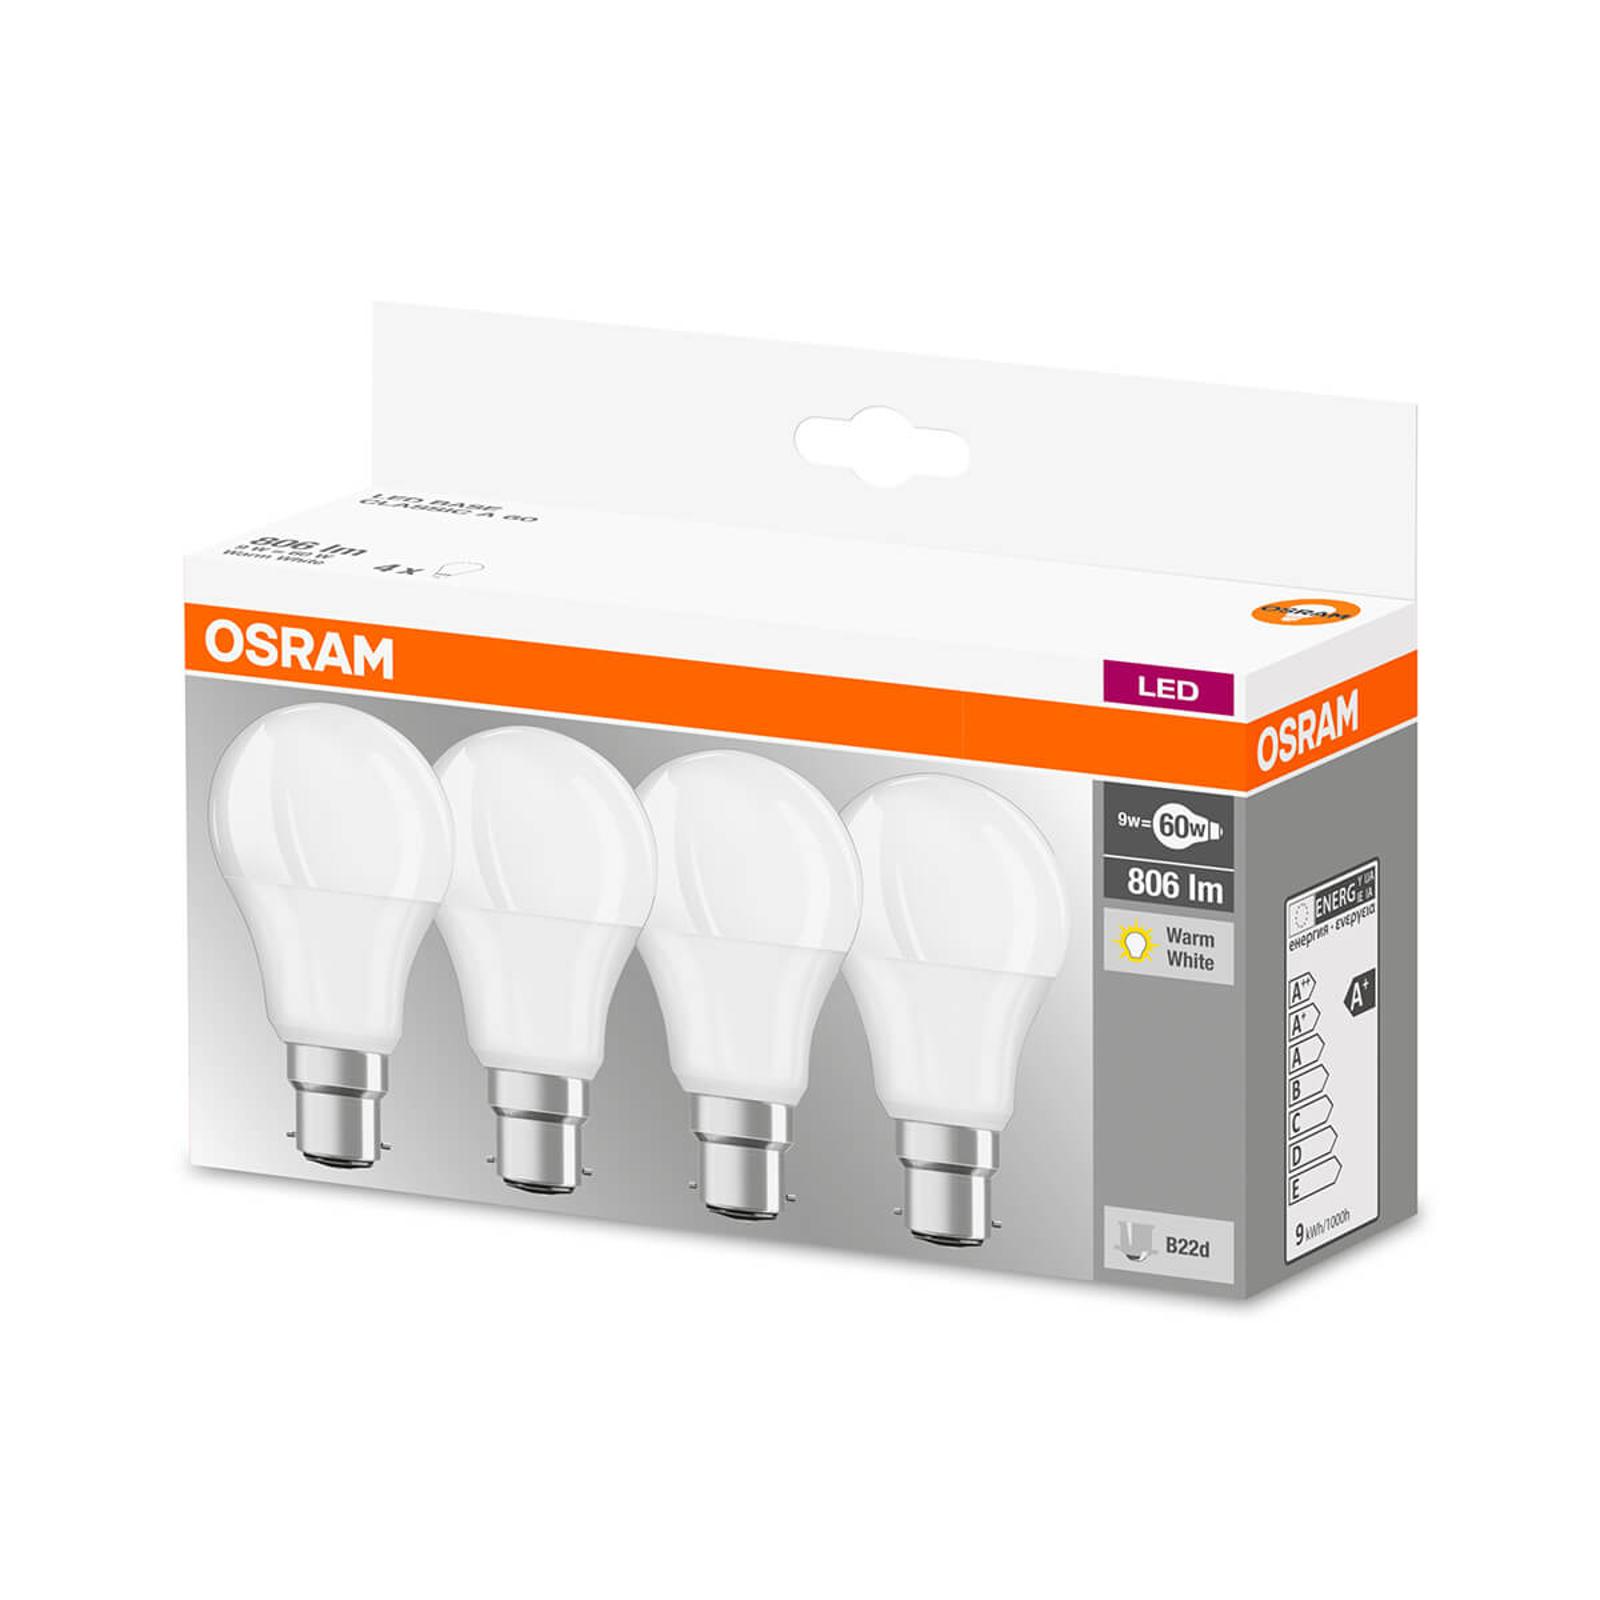 LED-Lampe B22d 9W, warmweiß, 806 Lumen, 4er-Set